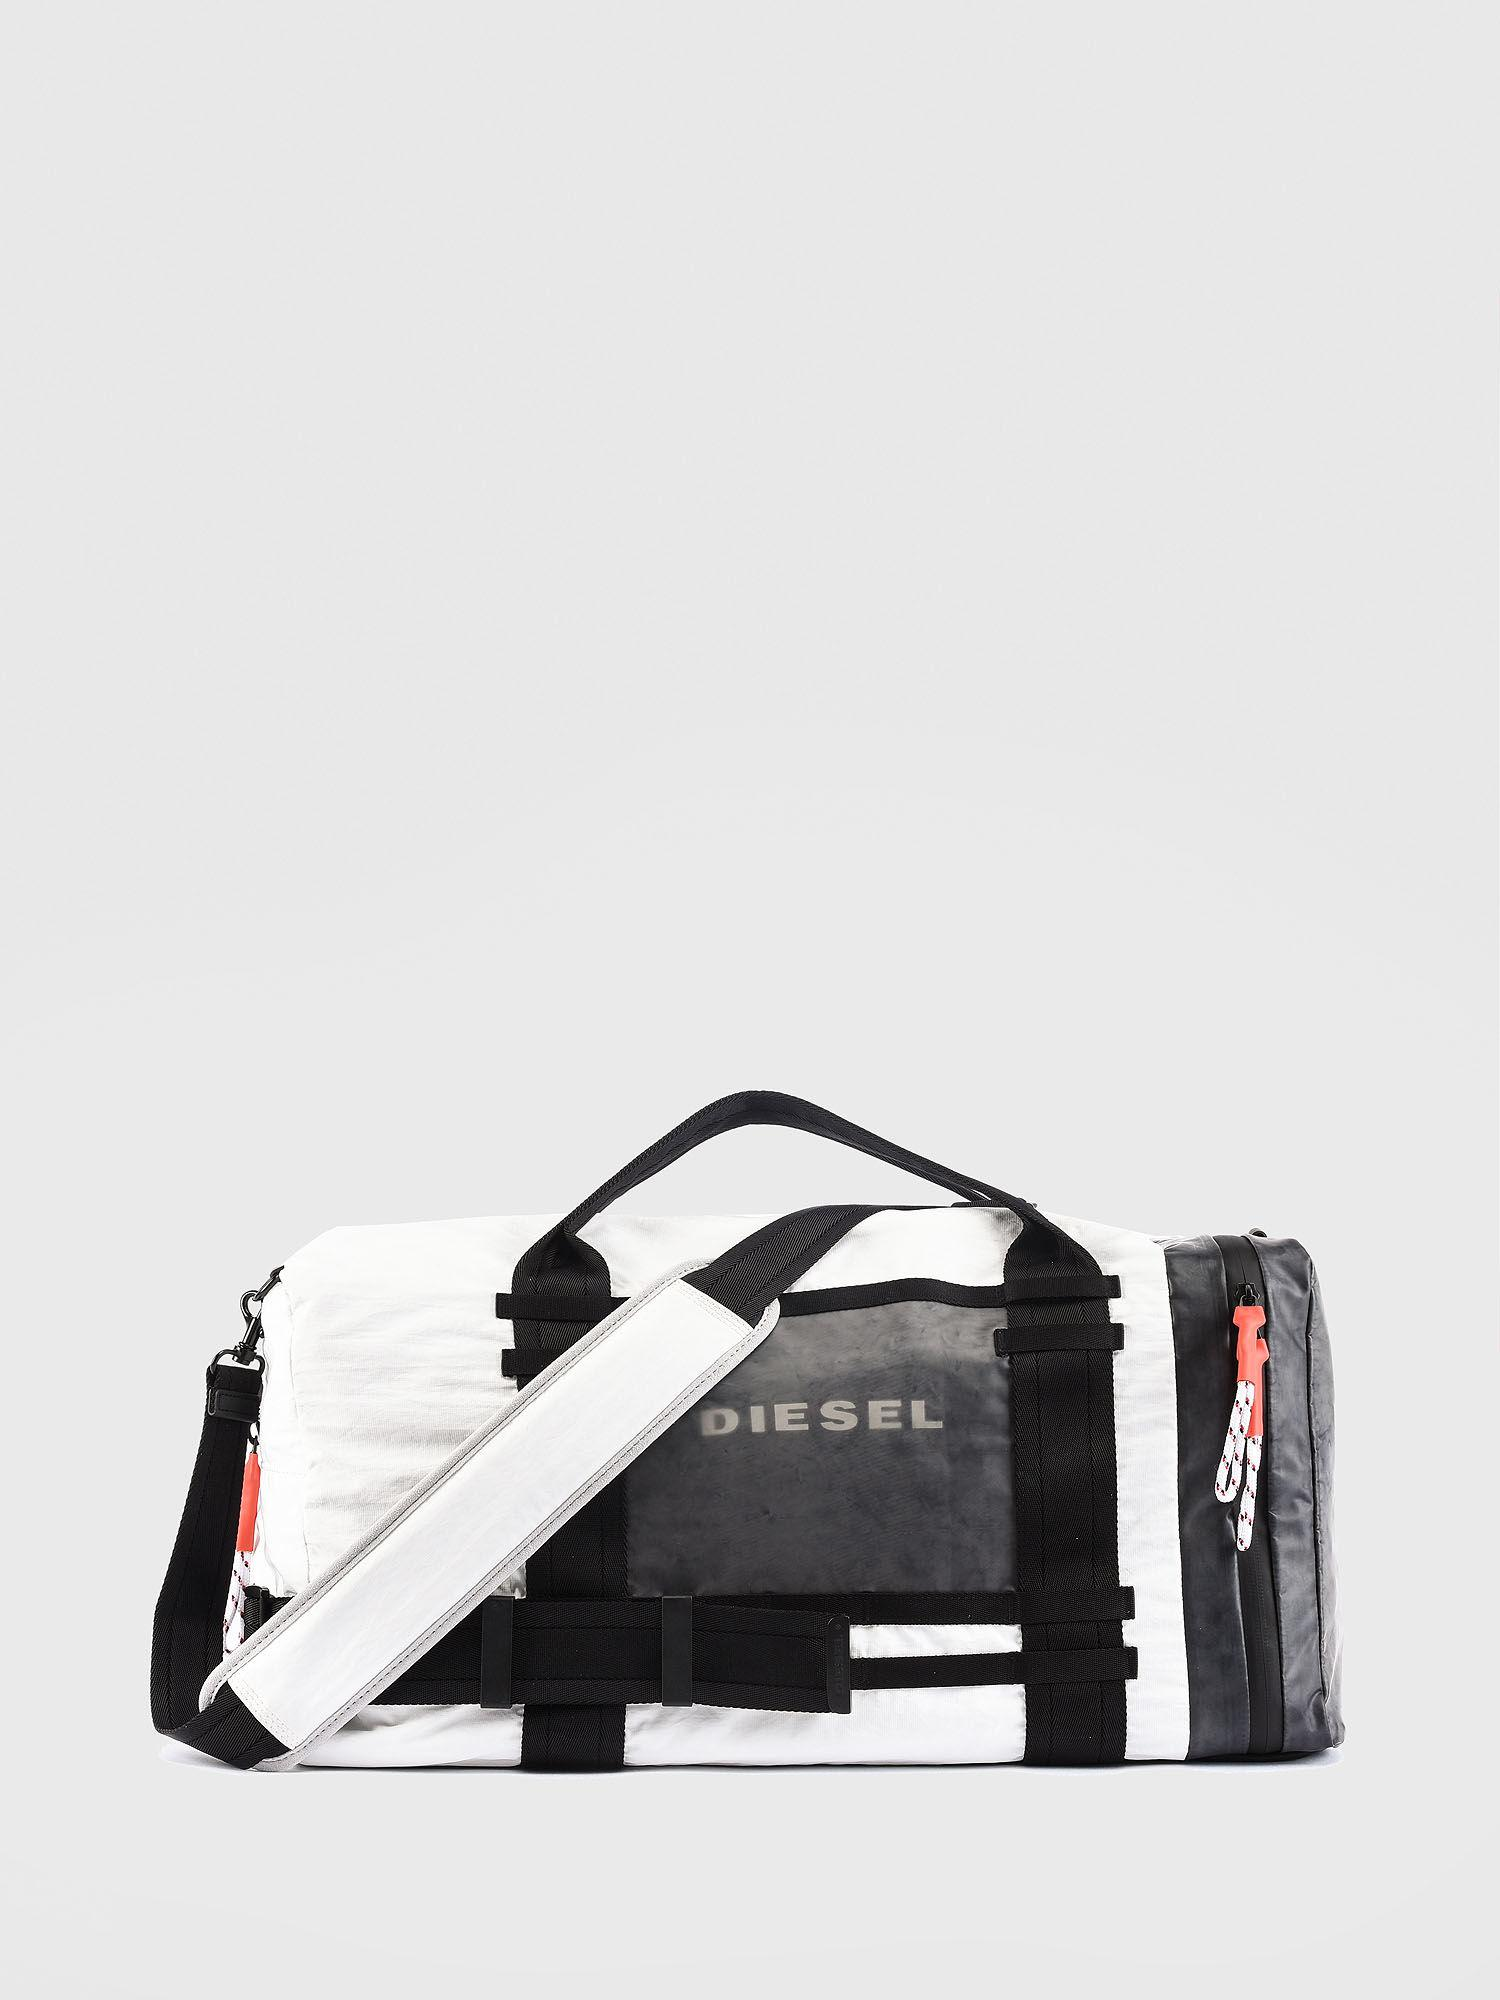 c49ea061bf1f DIESEL - Black Nylon Duffel With Sporty Detailing for Men - Lyst. View  fullscreen